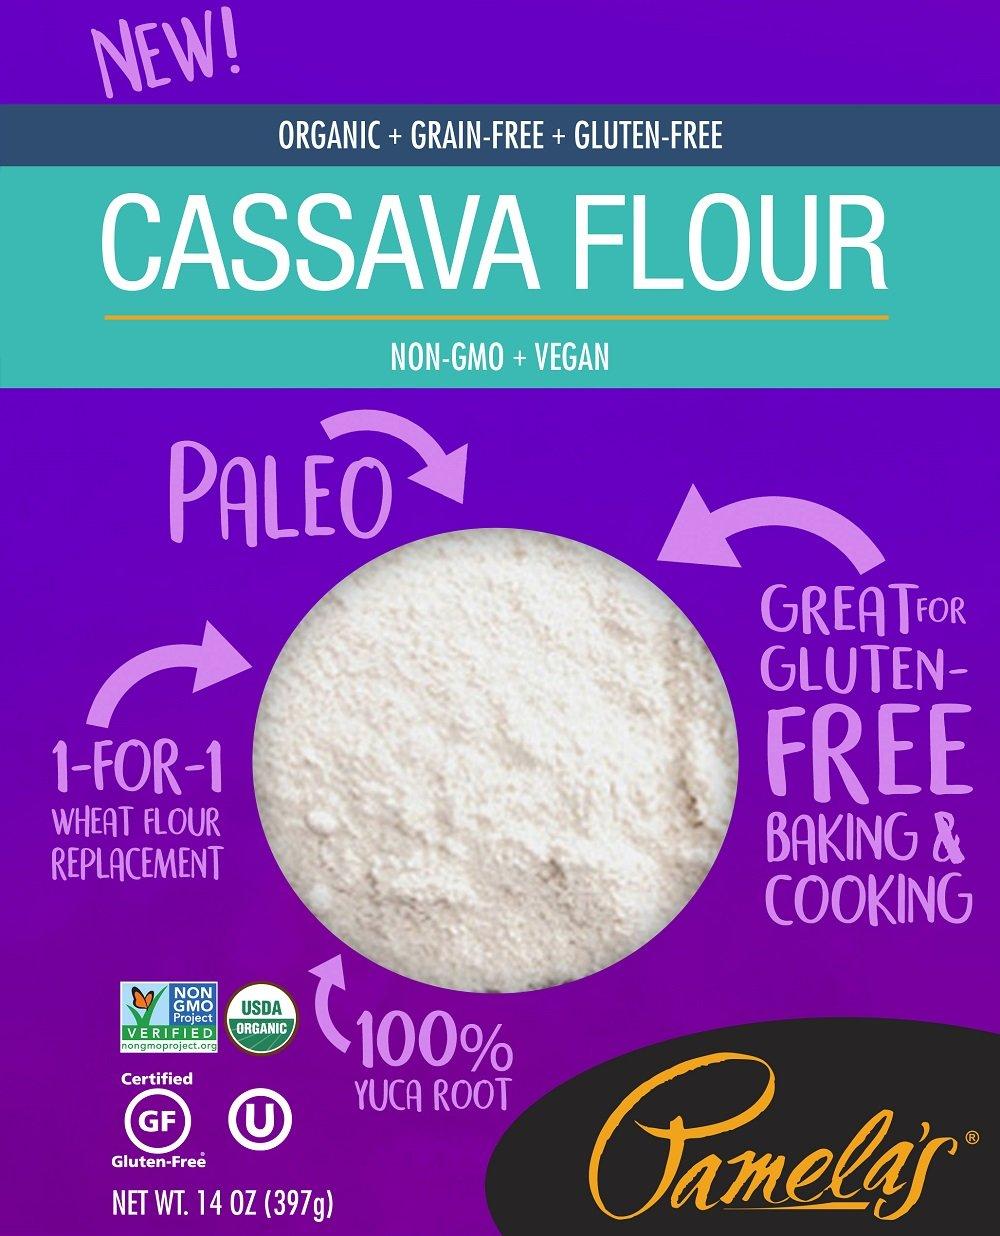 Pamela's Products Organic Cassava Flour, Grain Free and Gluten Free Paleo Flour, 14 Oz, 6 Count by Pamela's Products